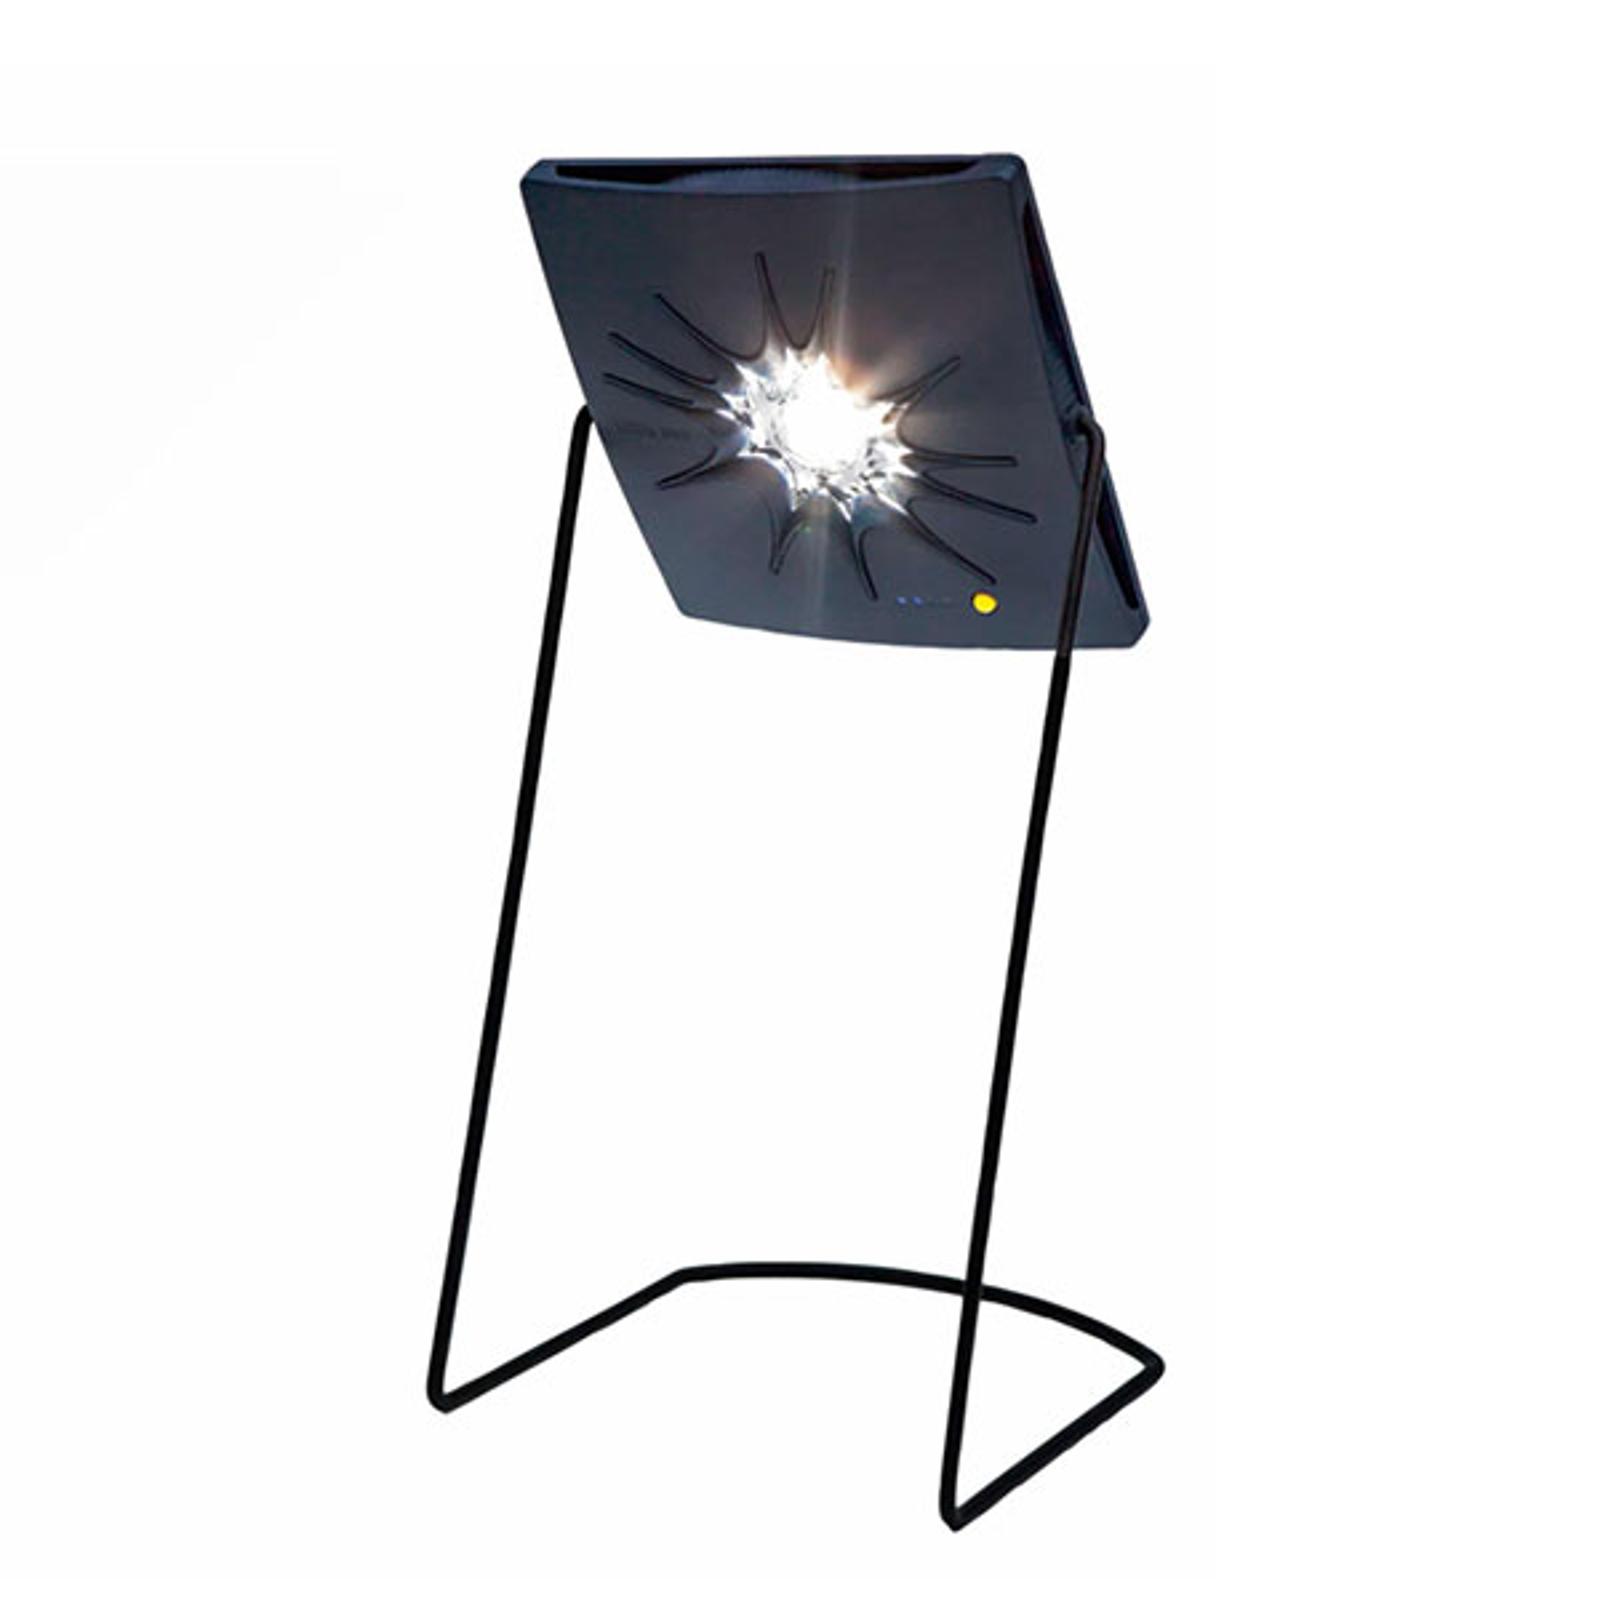 Soporte para lámpara solar Little Sun Charge